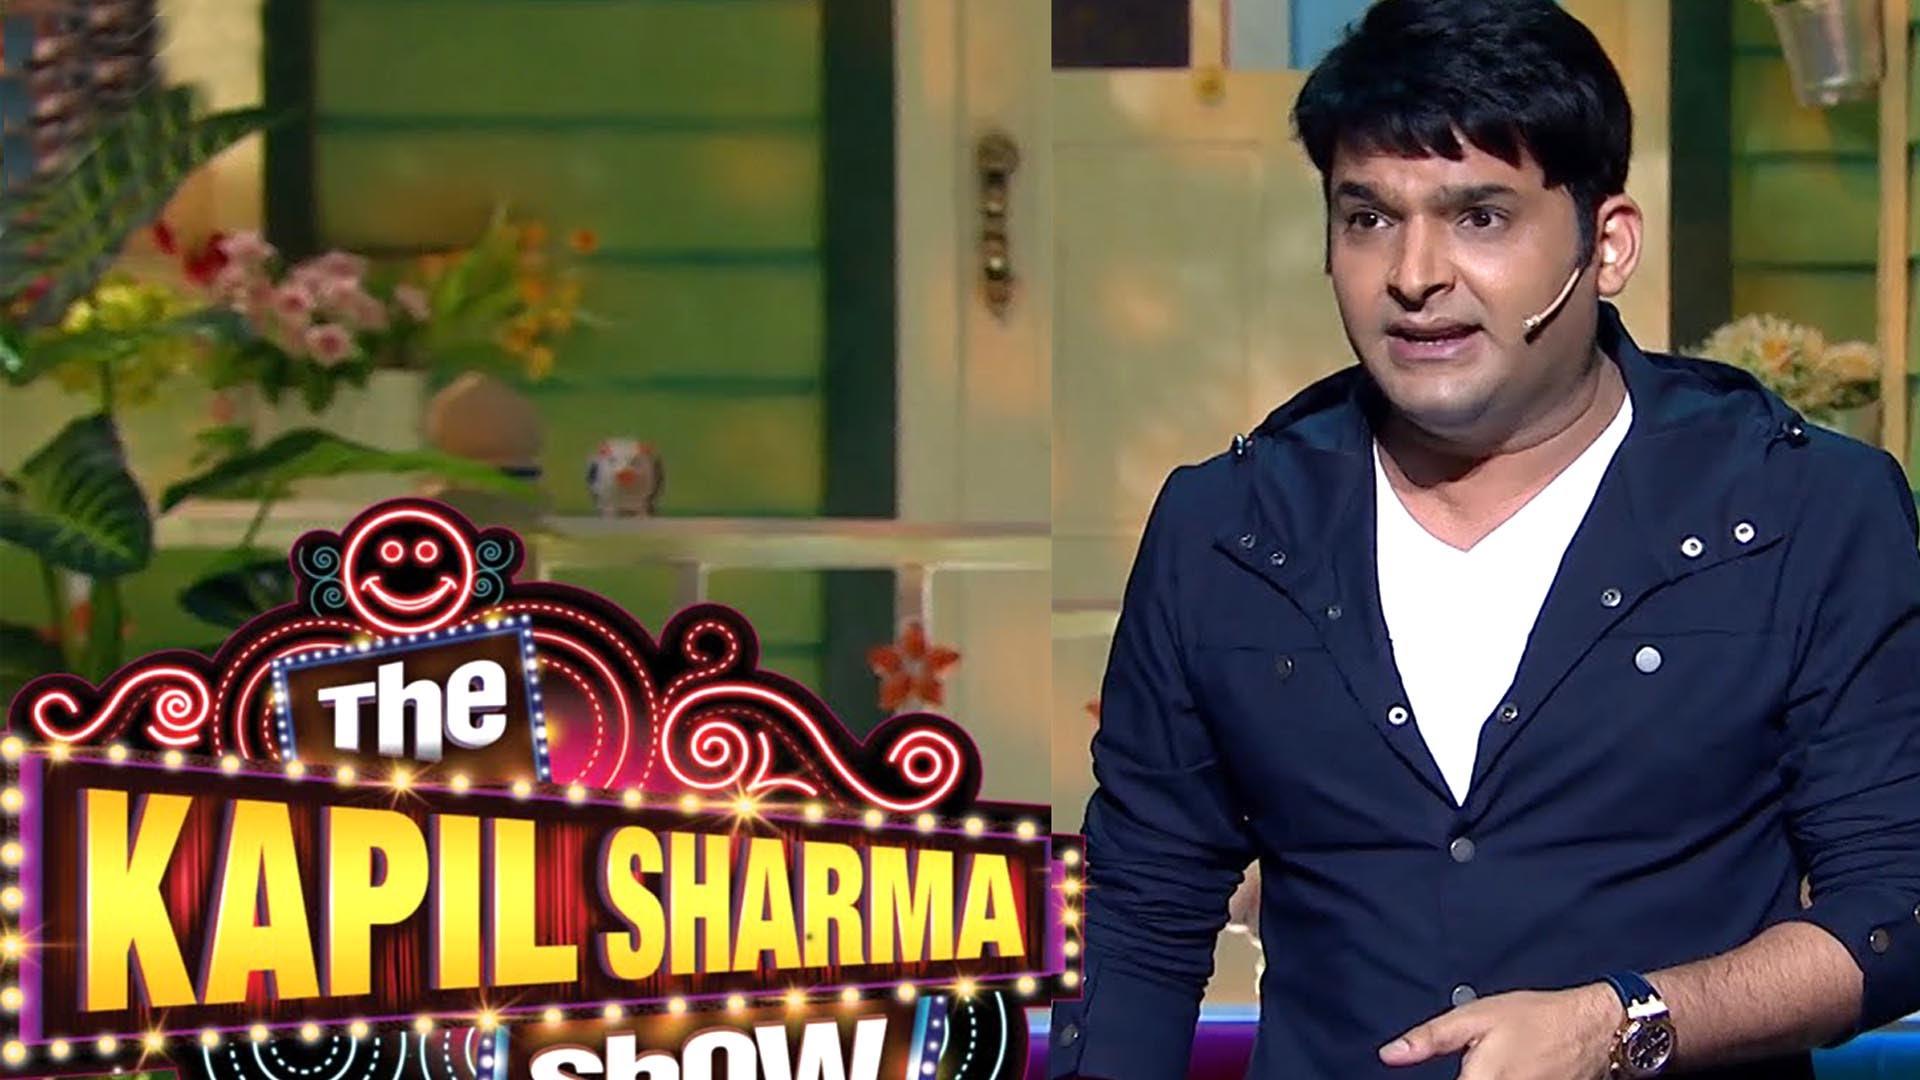 The Kapil Sharma Show पर लगा contempt of court का आरोप, इस तारीख को होगी सुनवाई